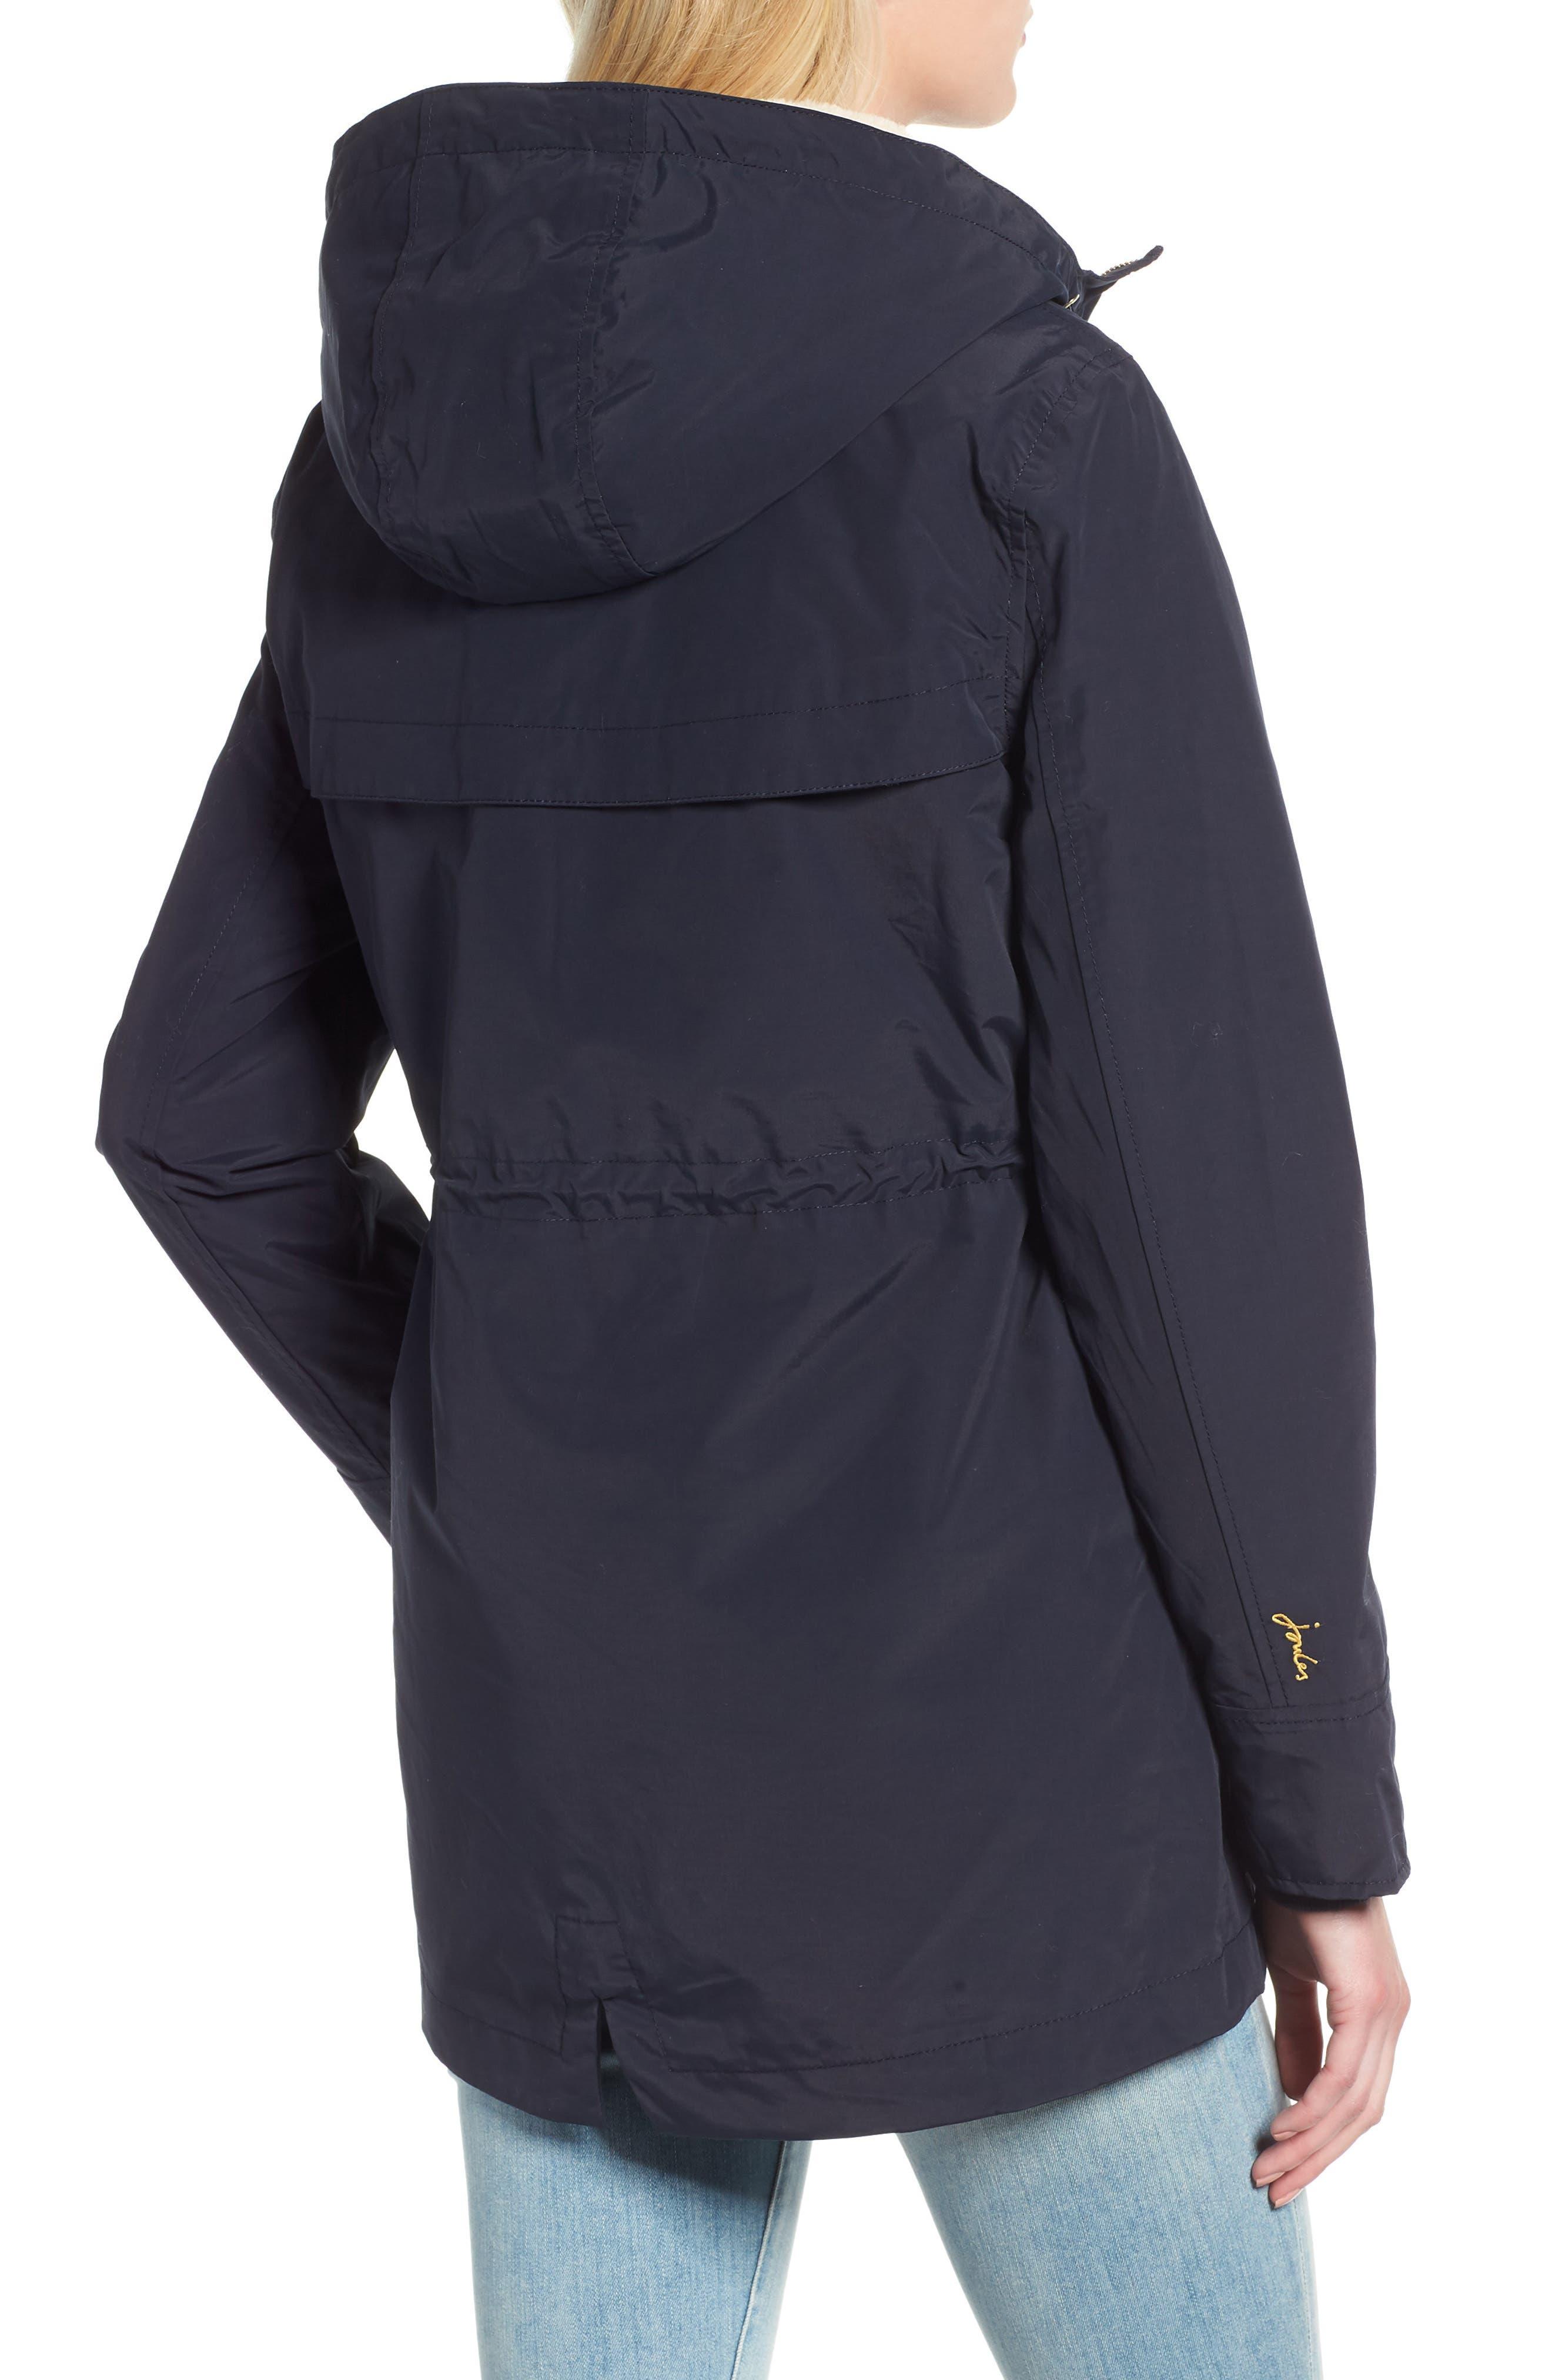 Women's amp; Nordstrom Jackets Coats Joules qwXwFR8